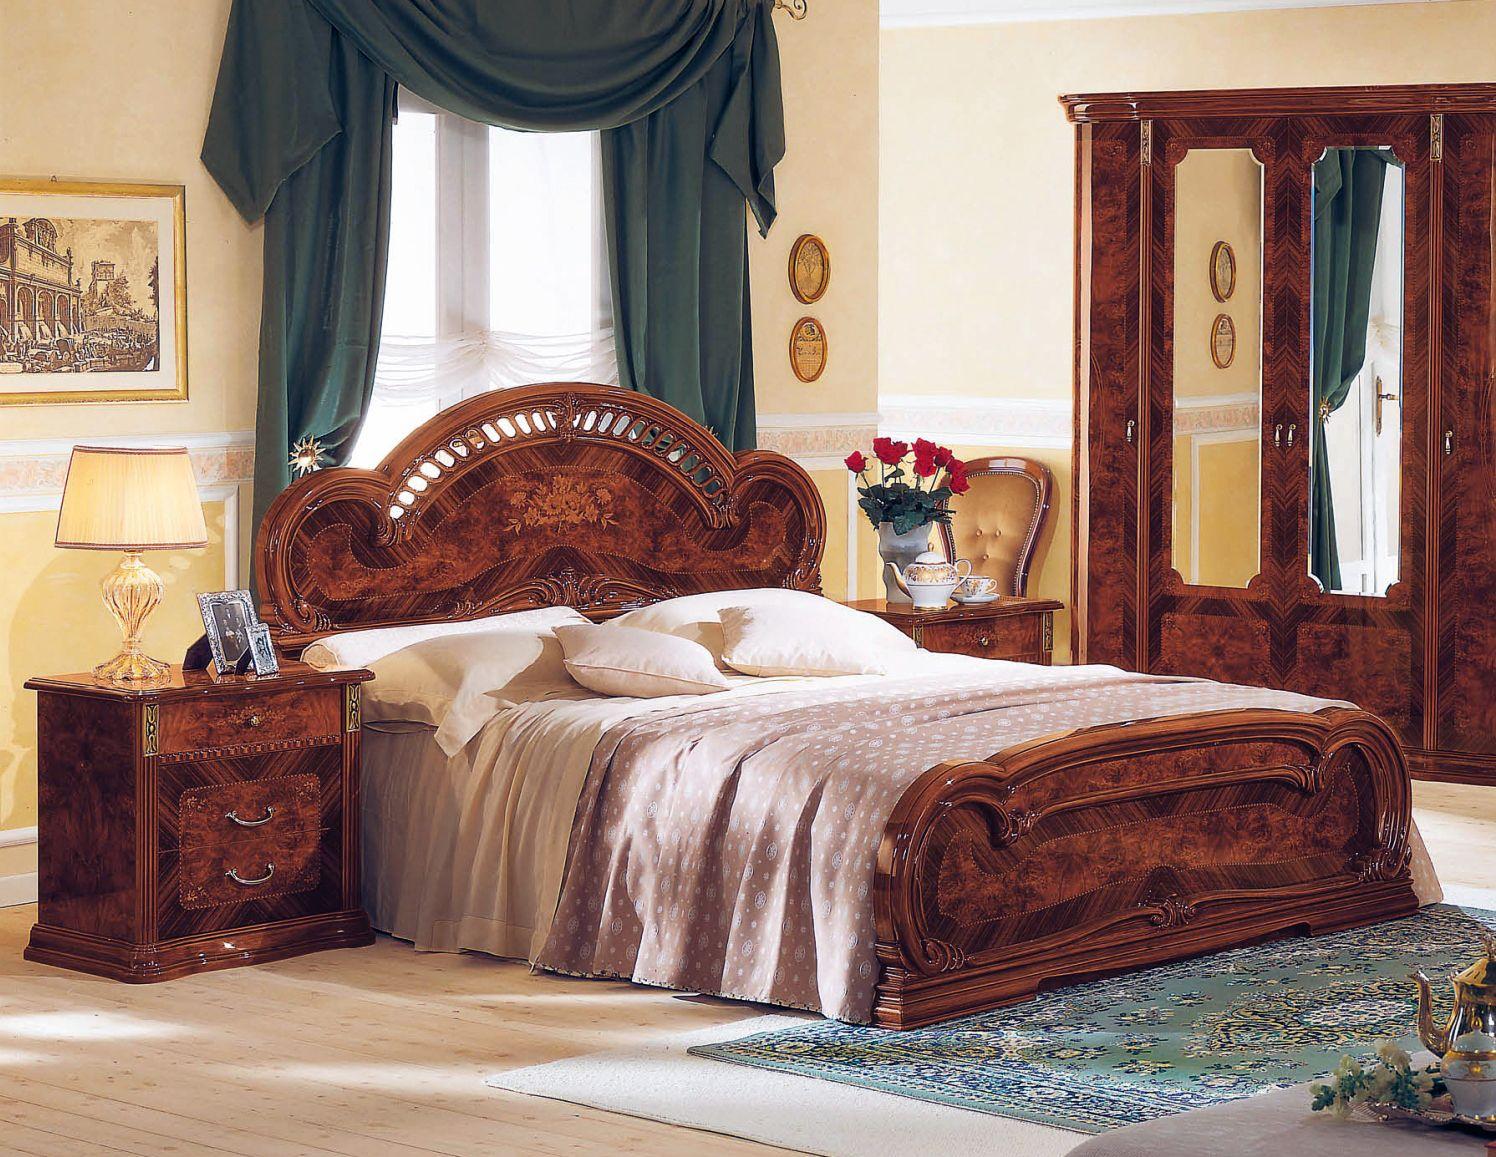 Milady Platform Bed in Walnut by ESF Italian bedroom